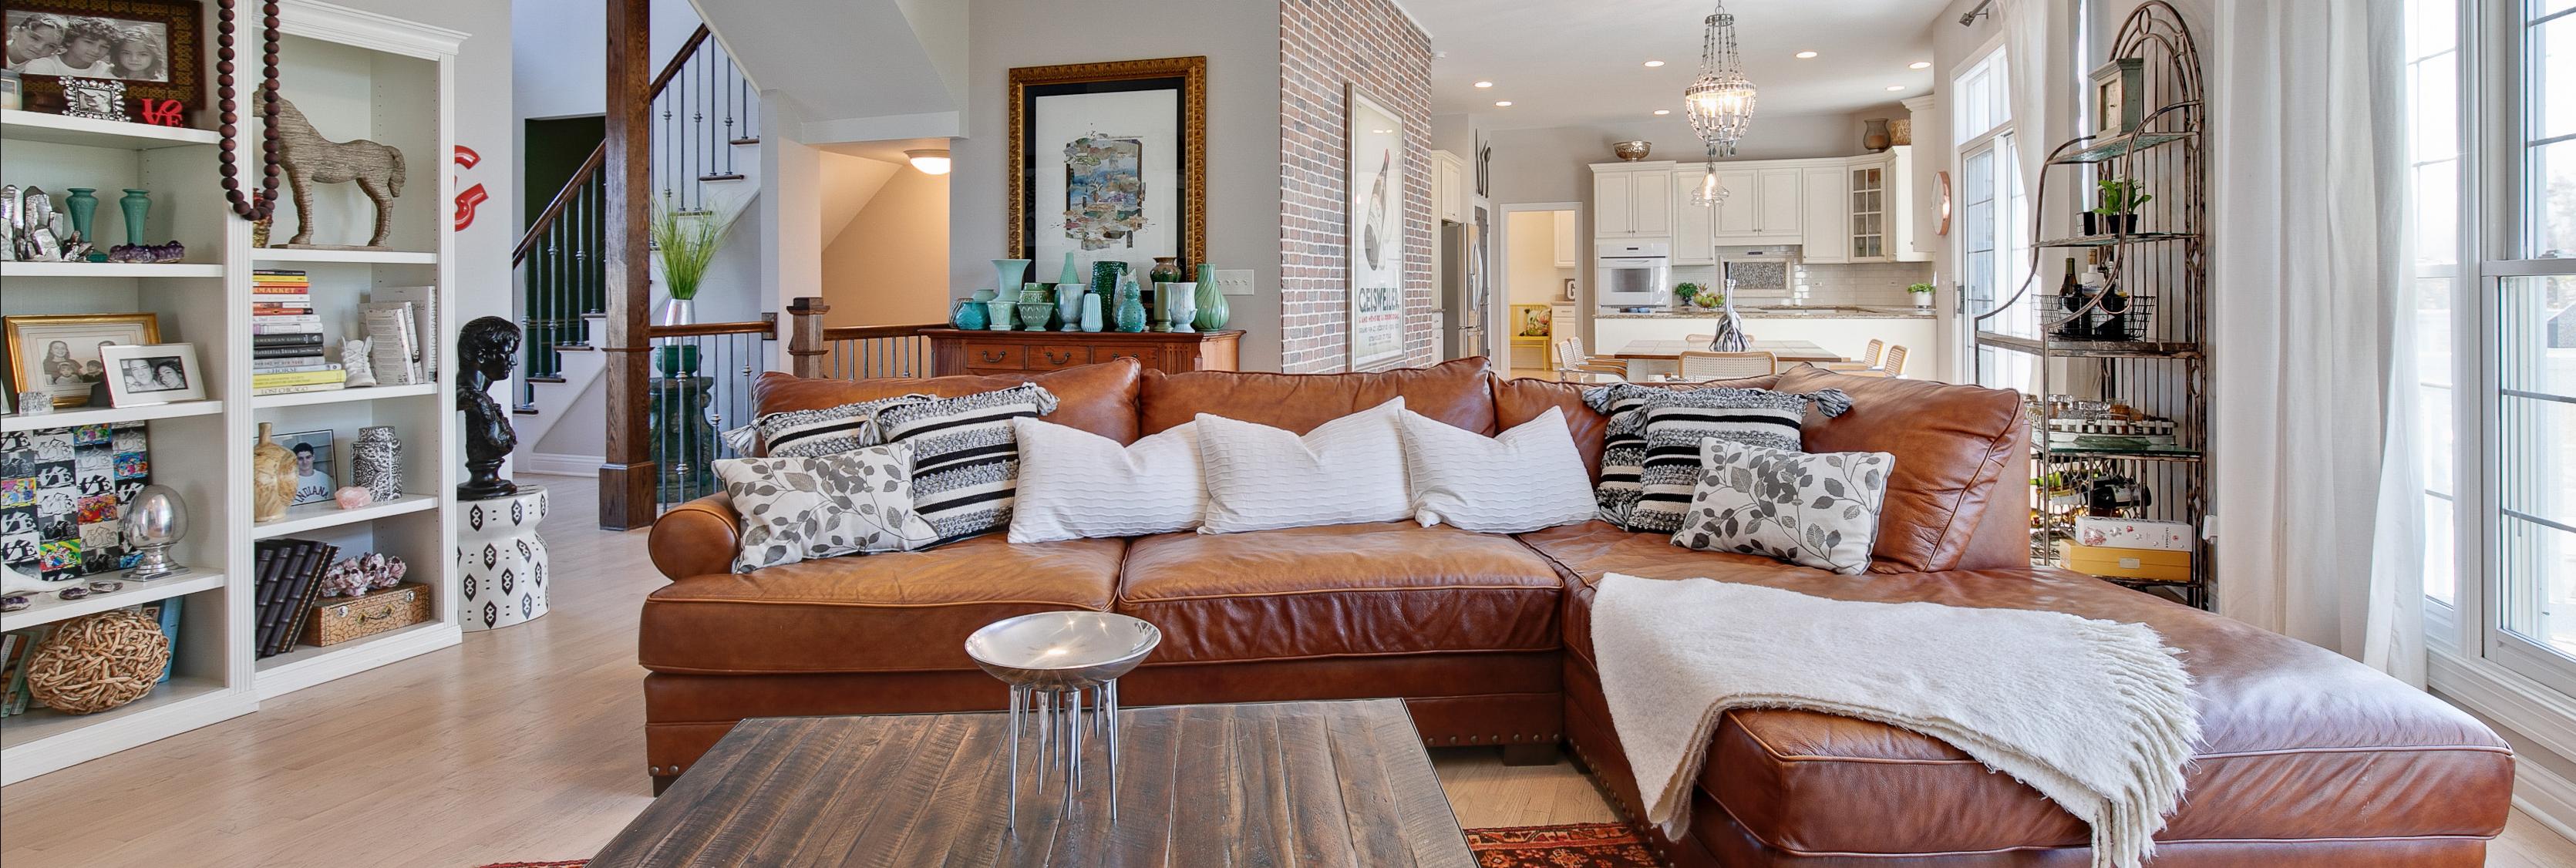 Lewke Partners - Keller Williams Success Realty reviews | Real Estate Services at 43 E Crystal Lake Ave - Crystal Lake IL